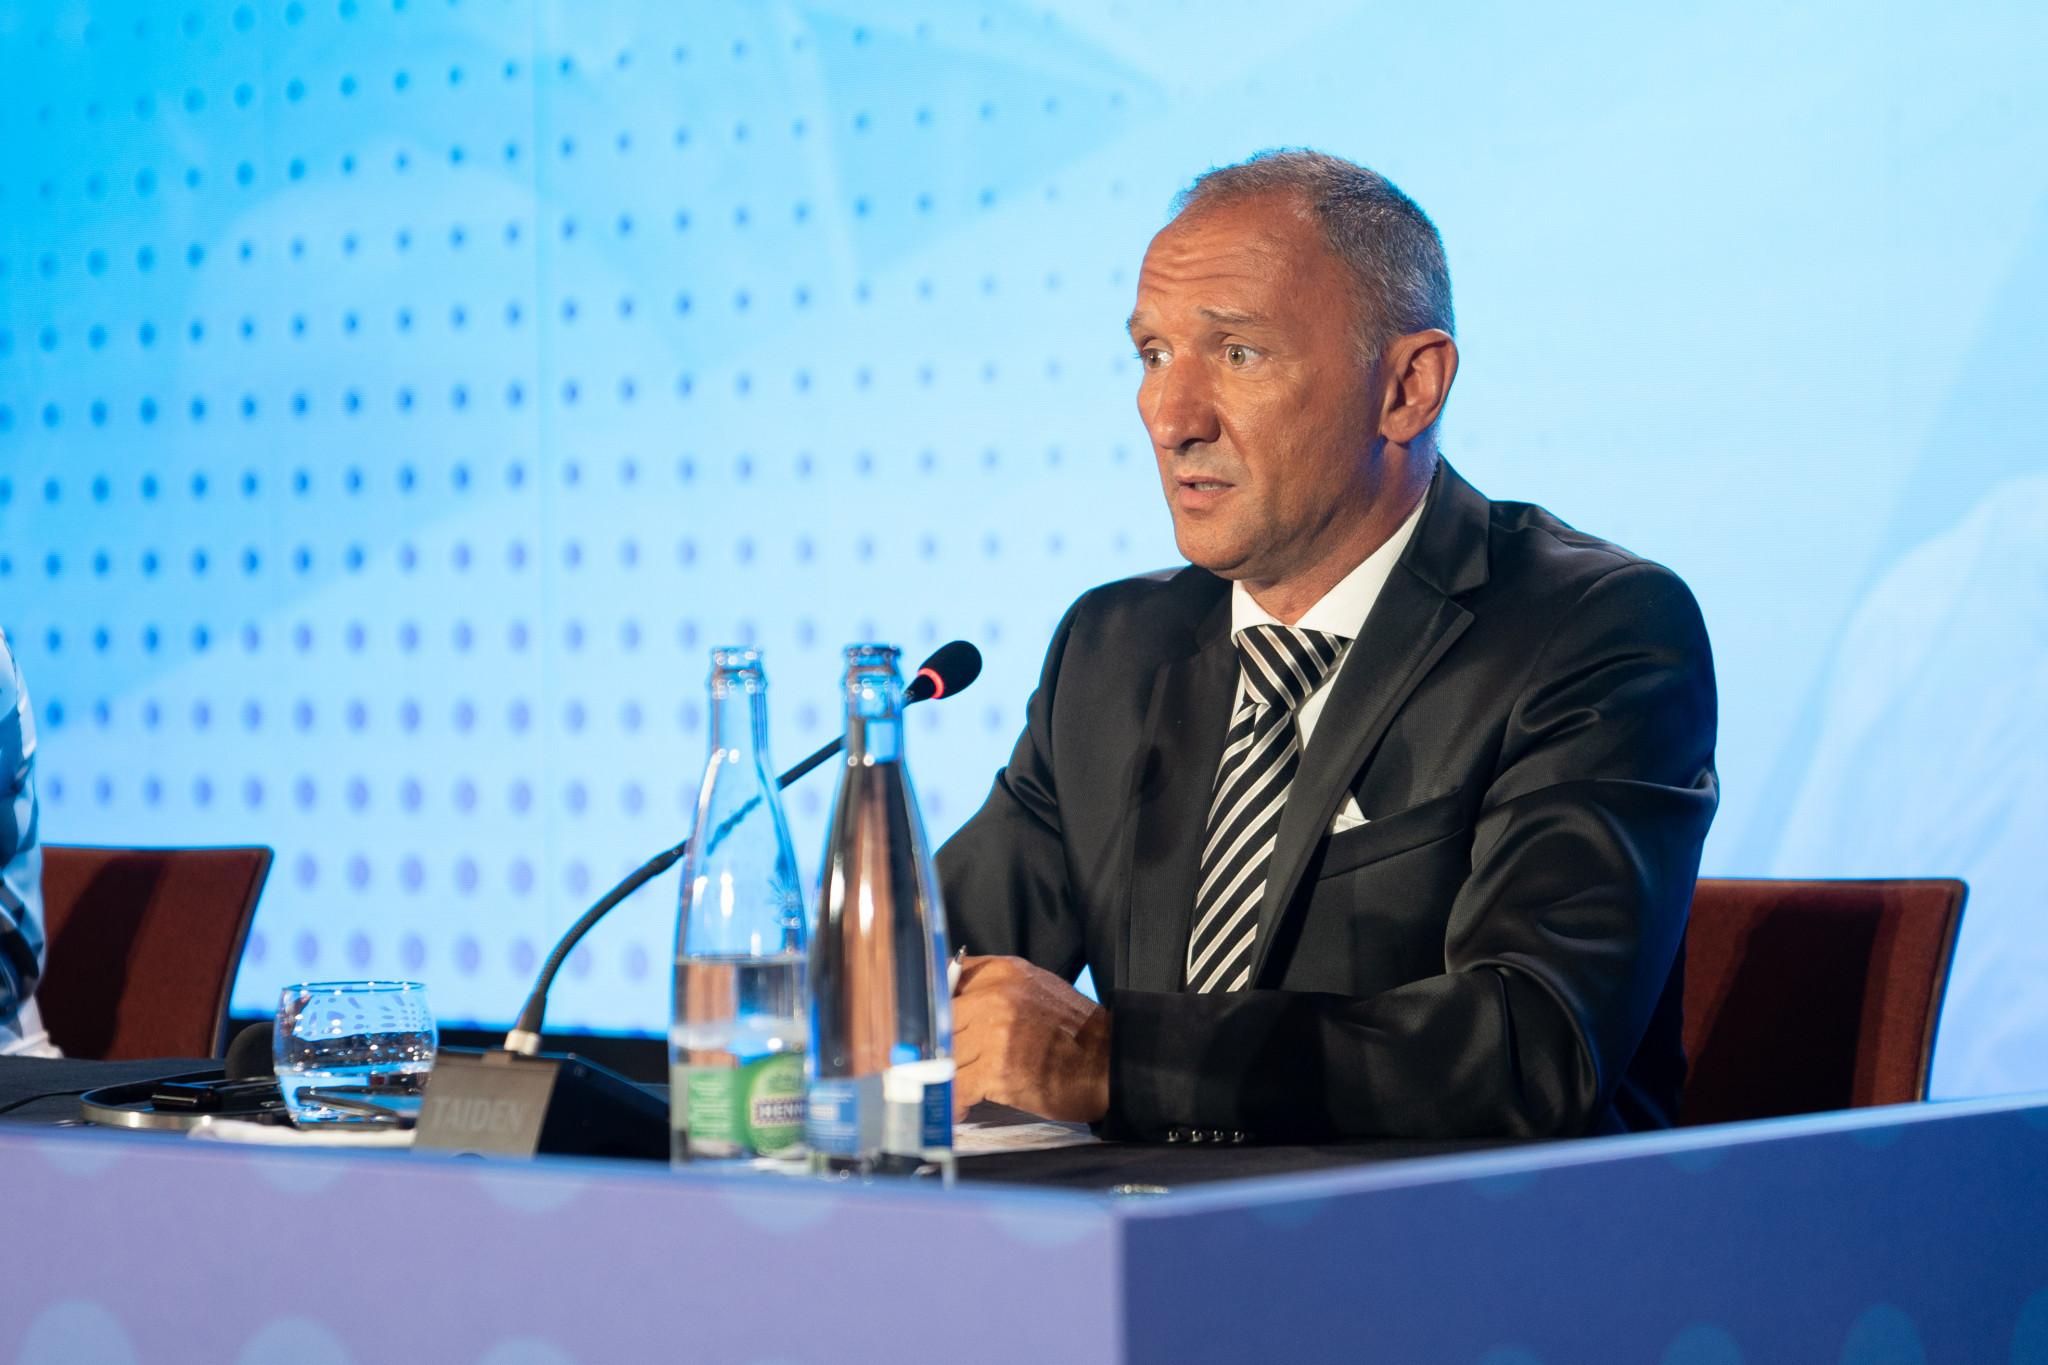 AIBA secretary general István Kovács claimed the organisation had already taken important steps in its reform process ©AIBA